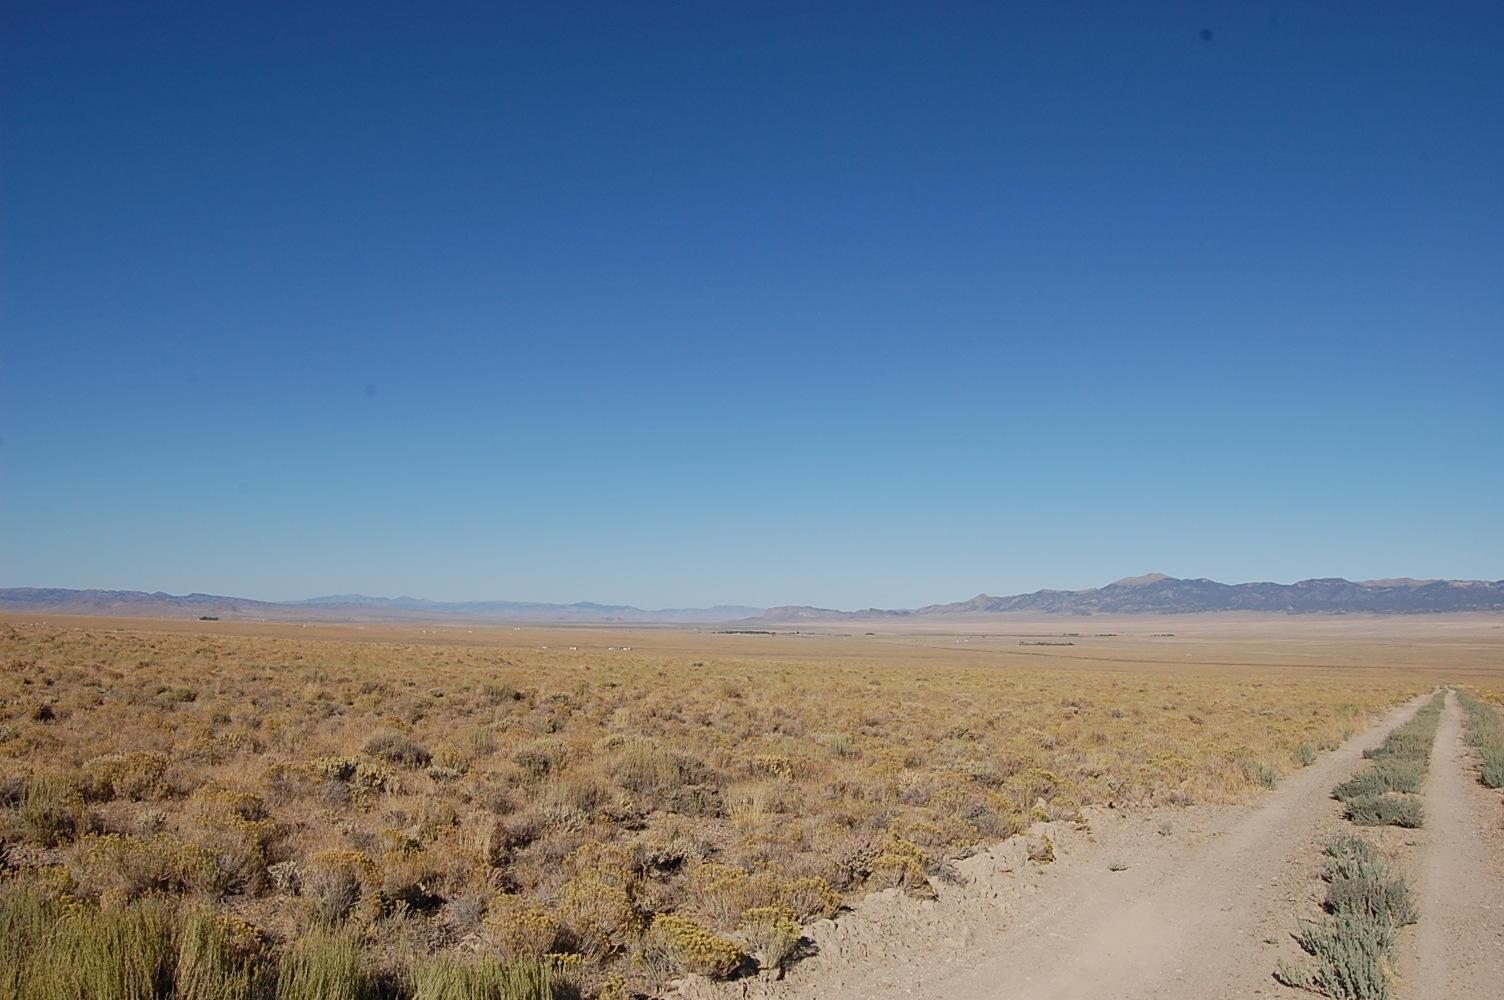 Escape into the Nevada Mountain Range on Stunning 2 Acres - Image 0